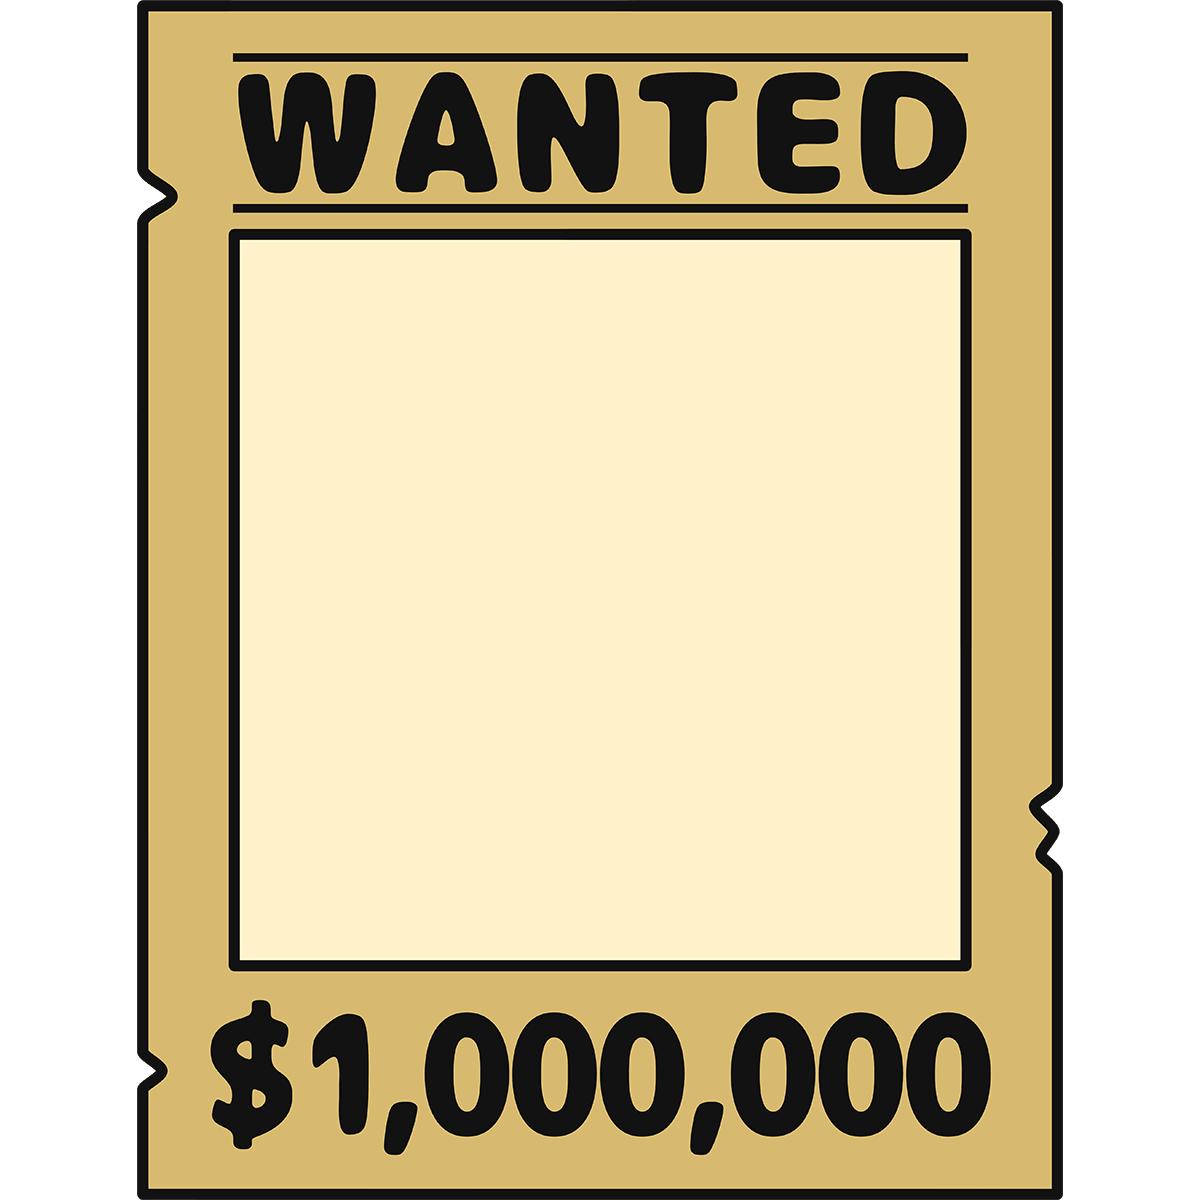 WANTEDのポスター(空欄)の無料イラスト